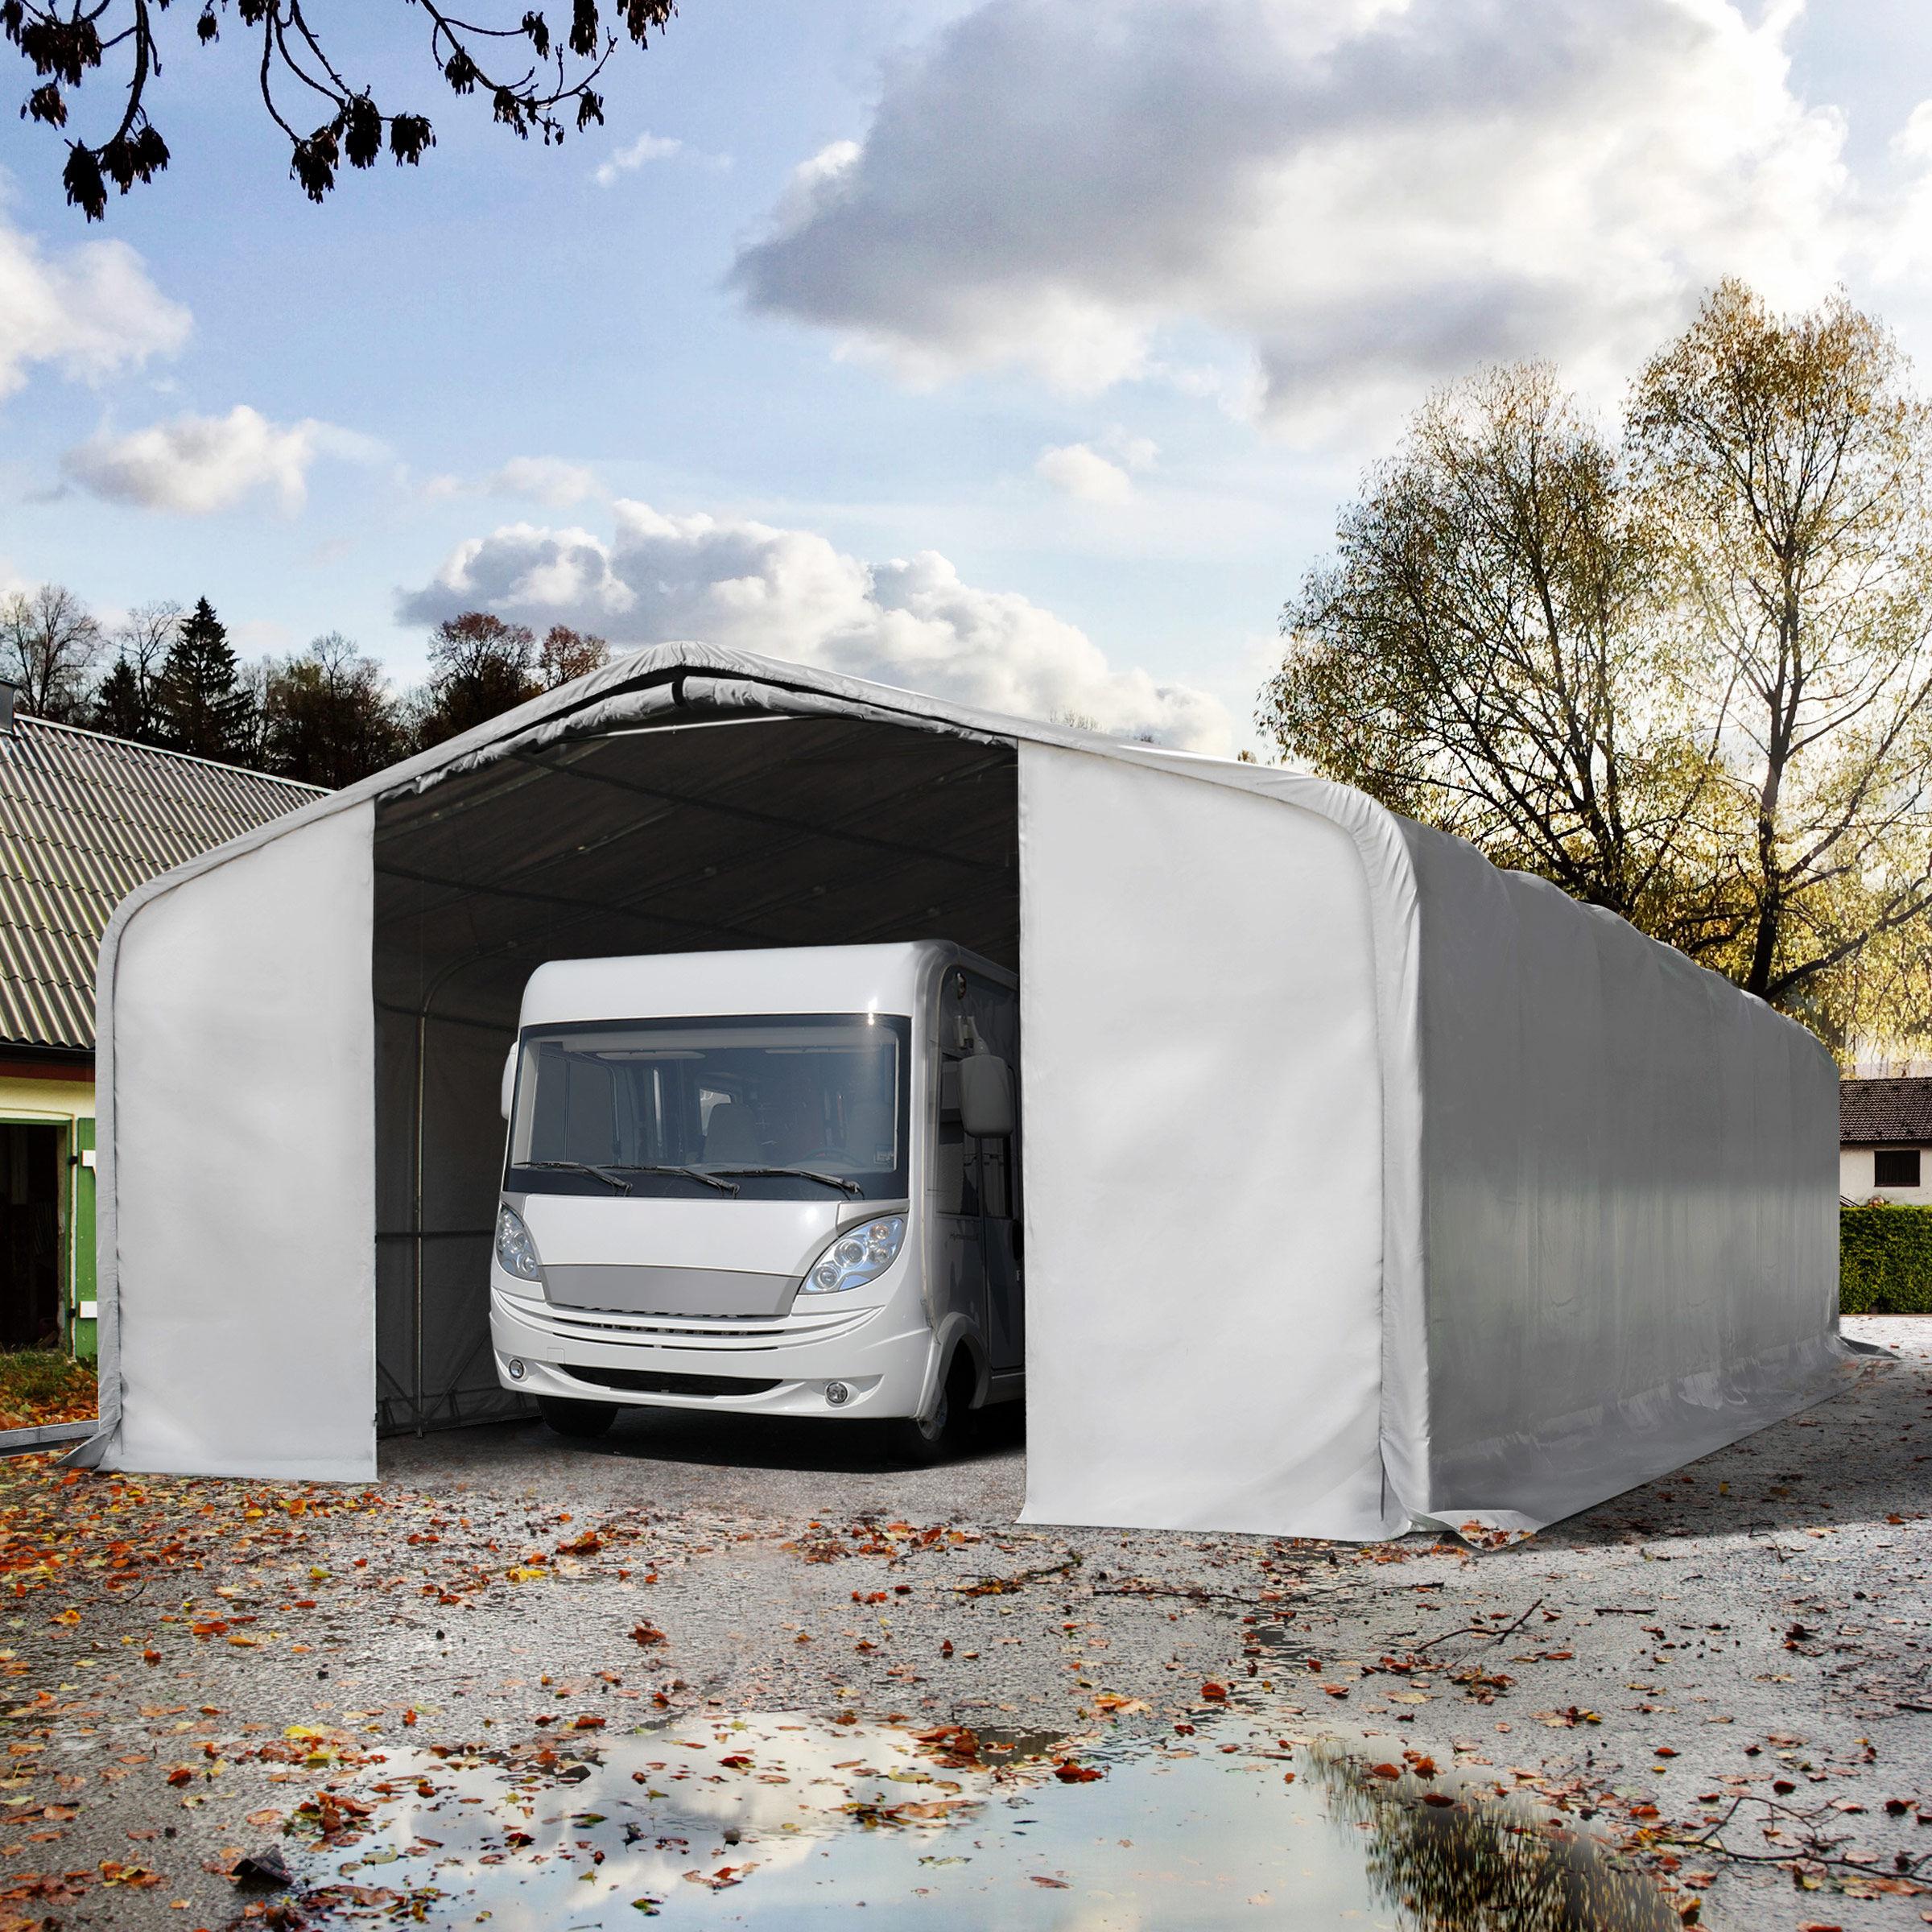 TOOLPORT Portable Garage 8x12m PVC 550 g/m² grey waterproof